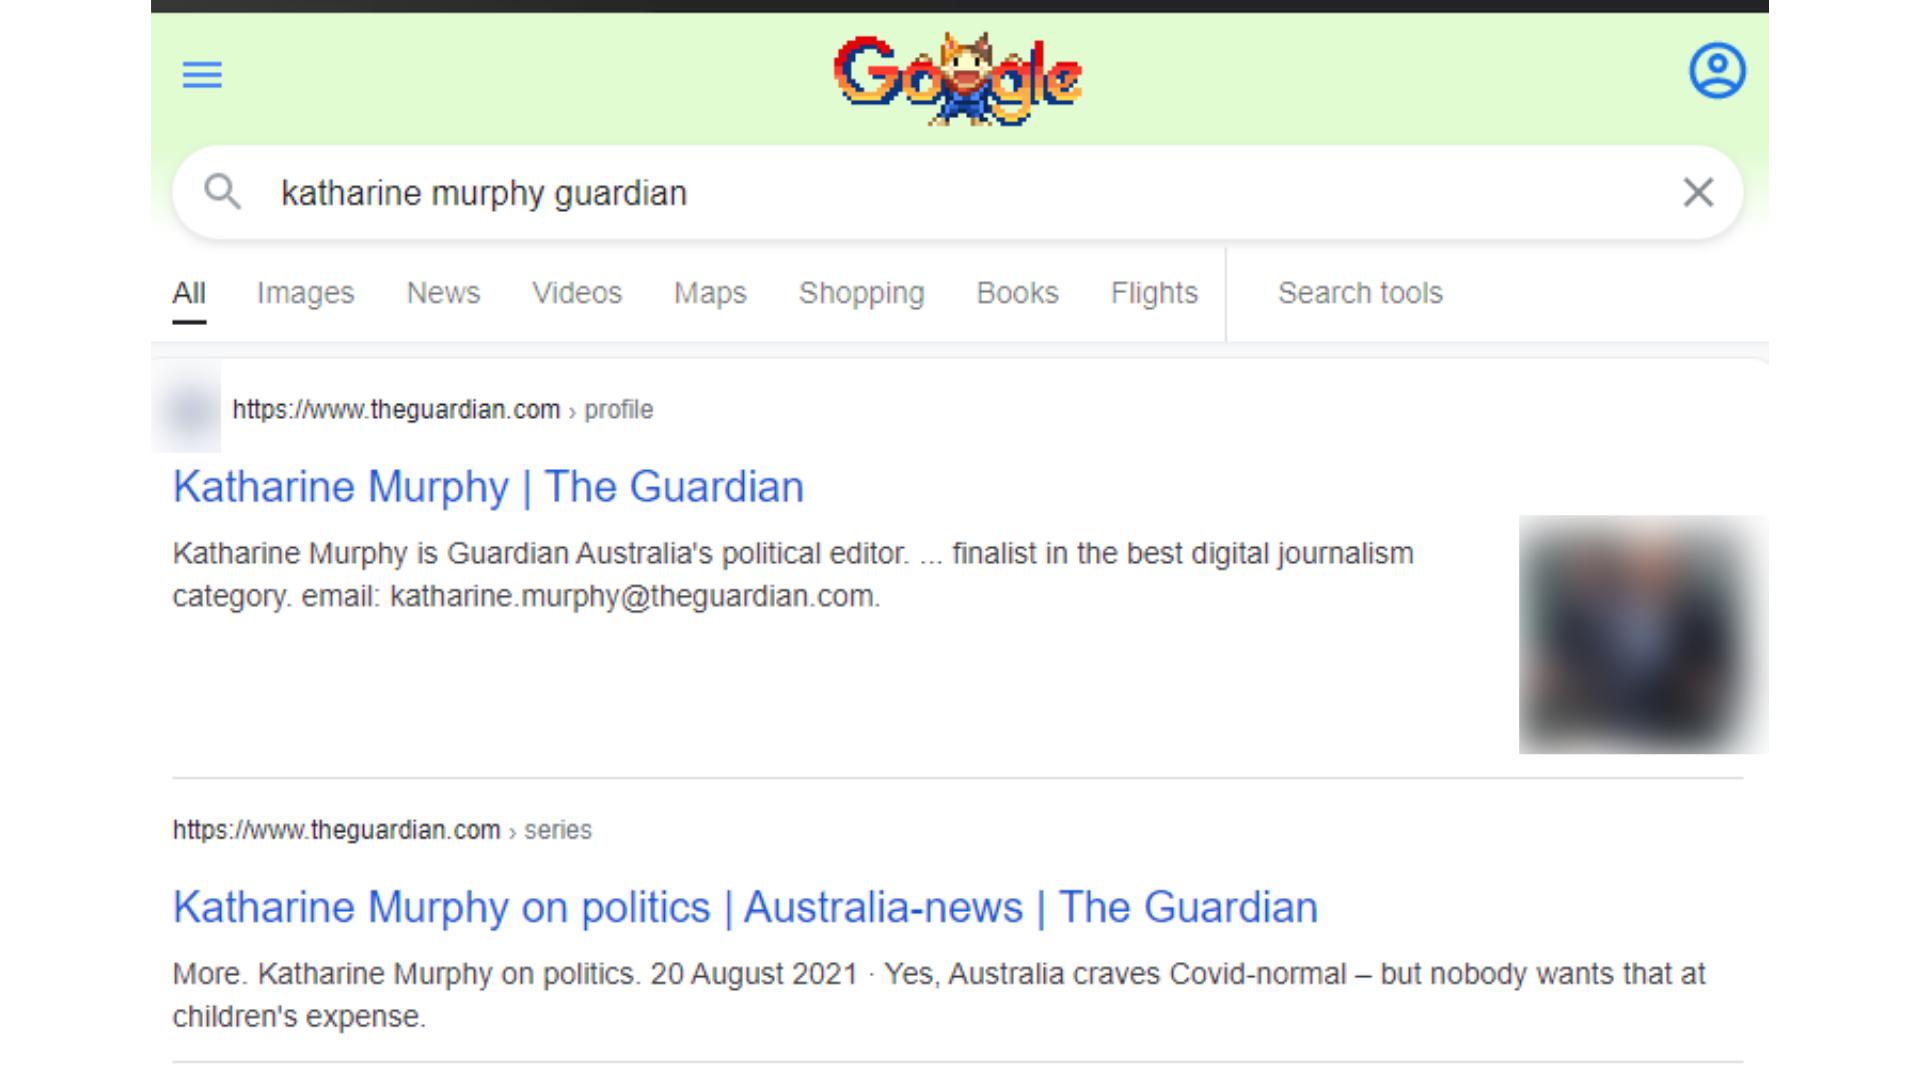 Katharine Murphy Guardian Google Search